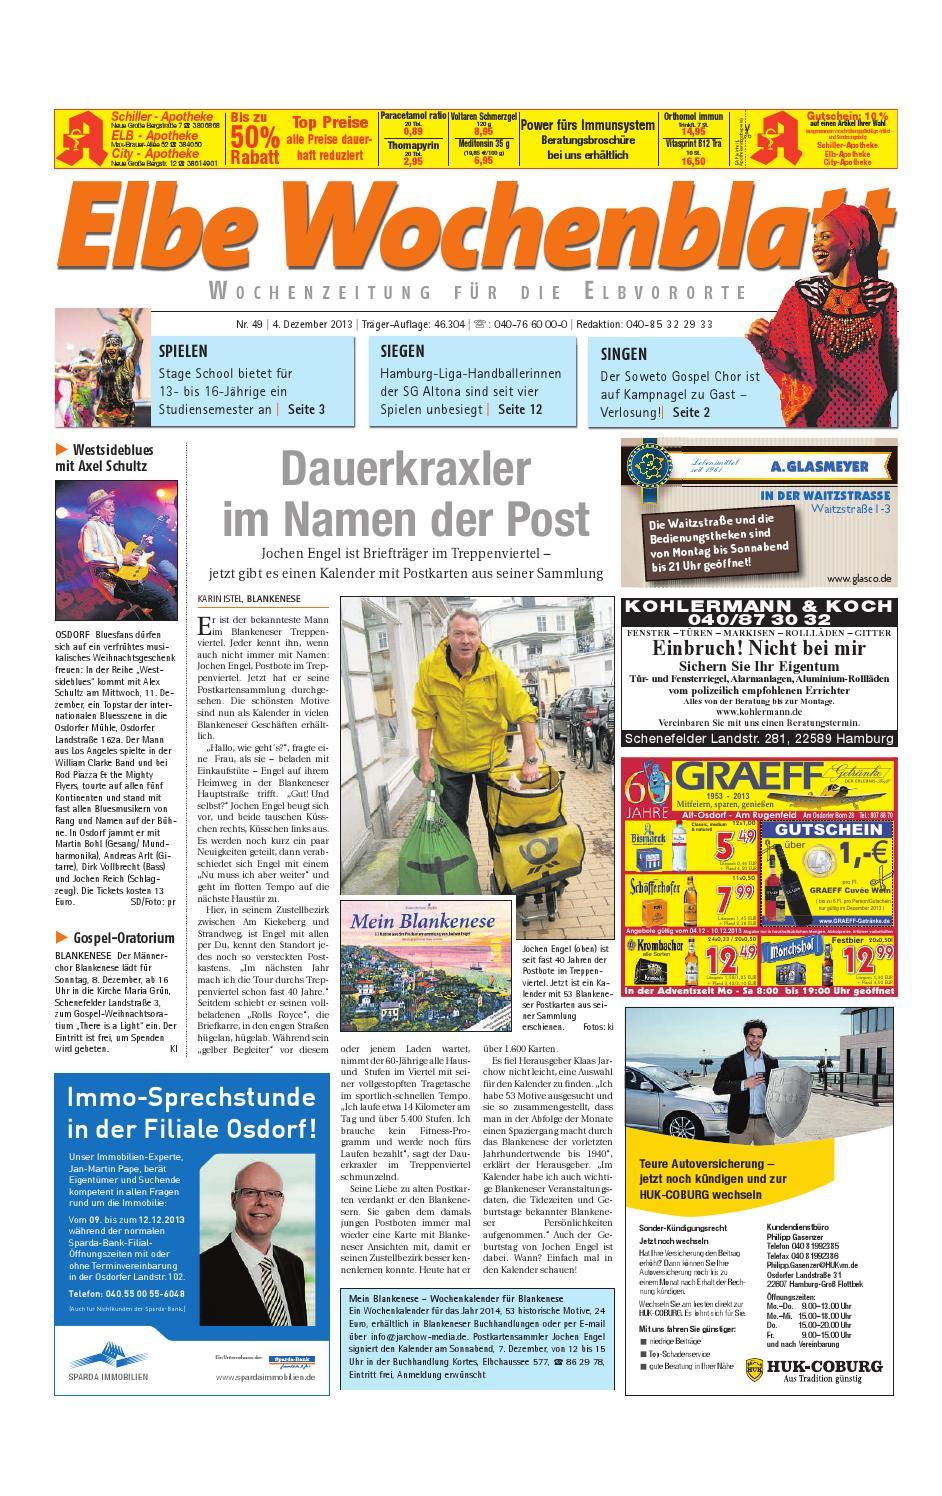 Elbvororte KW49-2013 by Elbe Wochenblatt Verlagsgesellschaft mbH & Co.KG -  issuu